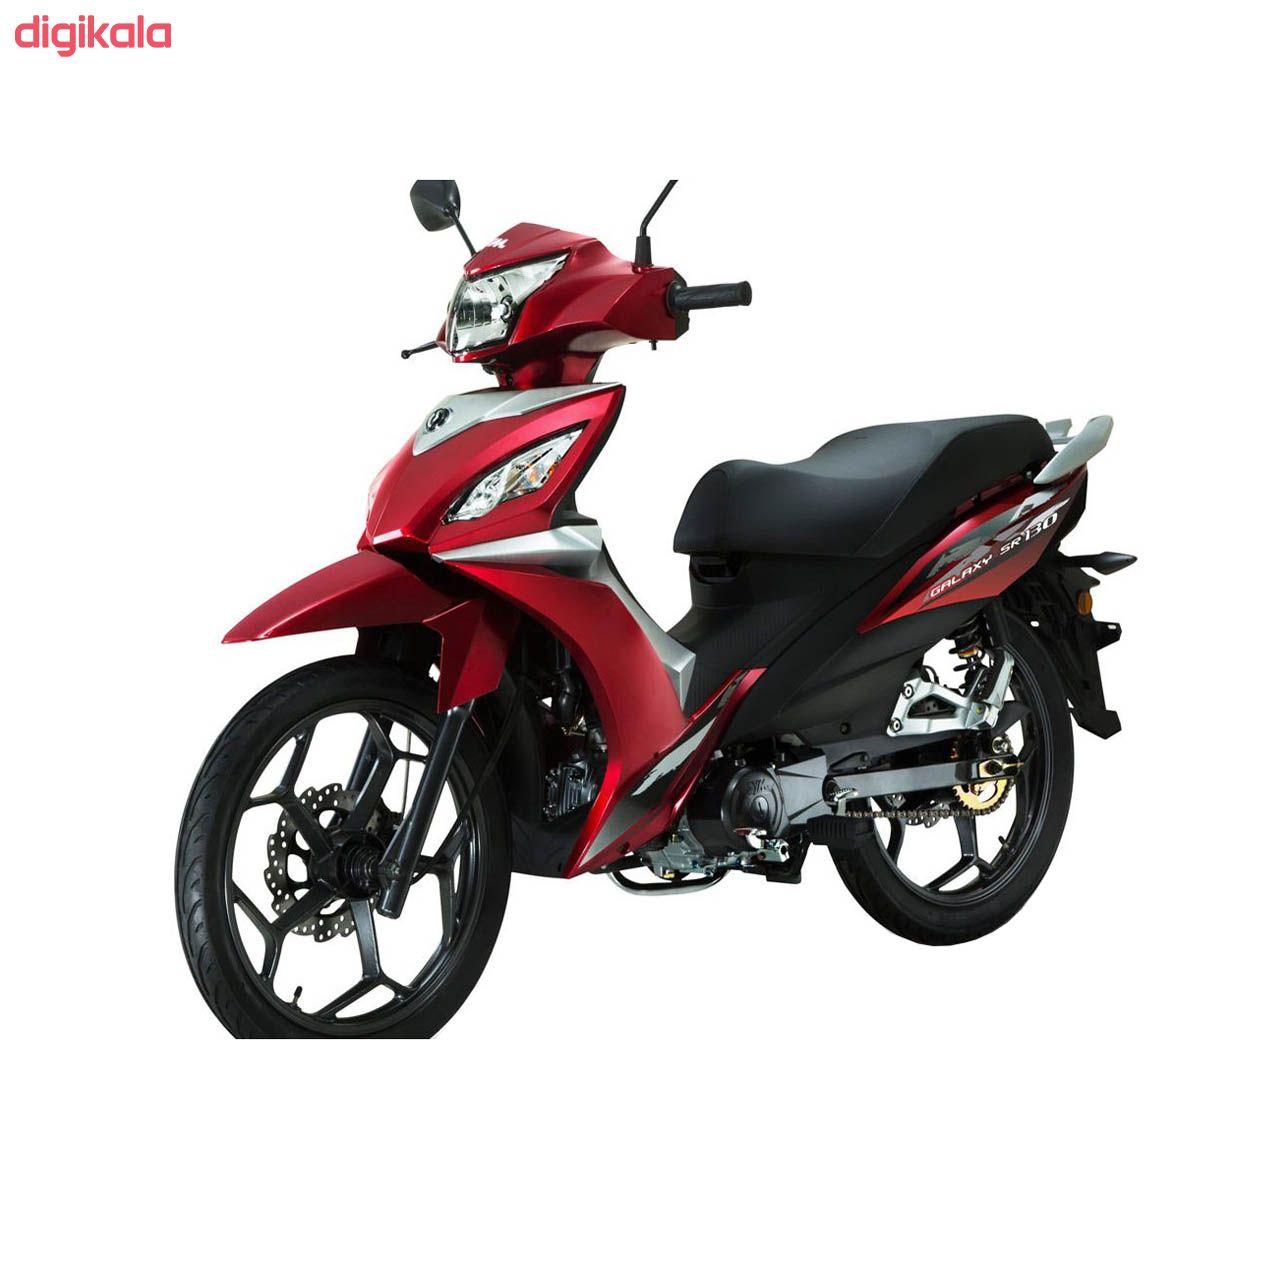 موتورسیکلت گلکسی مدل SR130 حجم 130 سی سیسال 1399 main 1 3